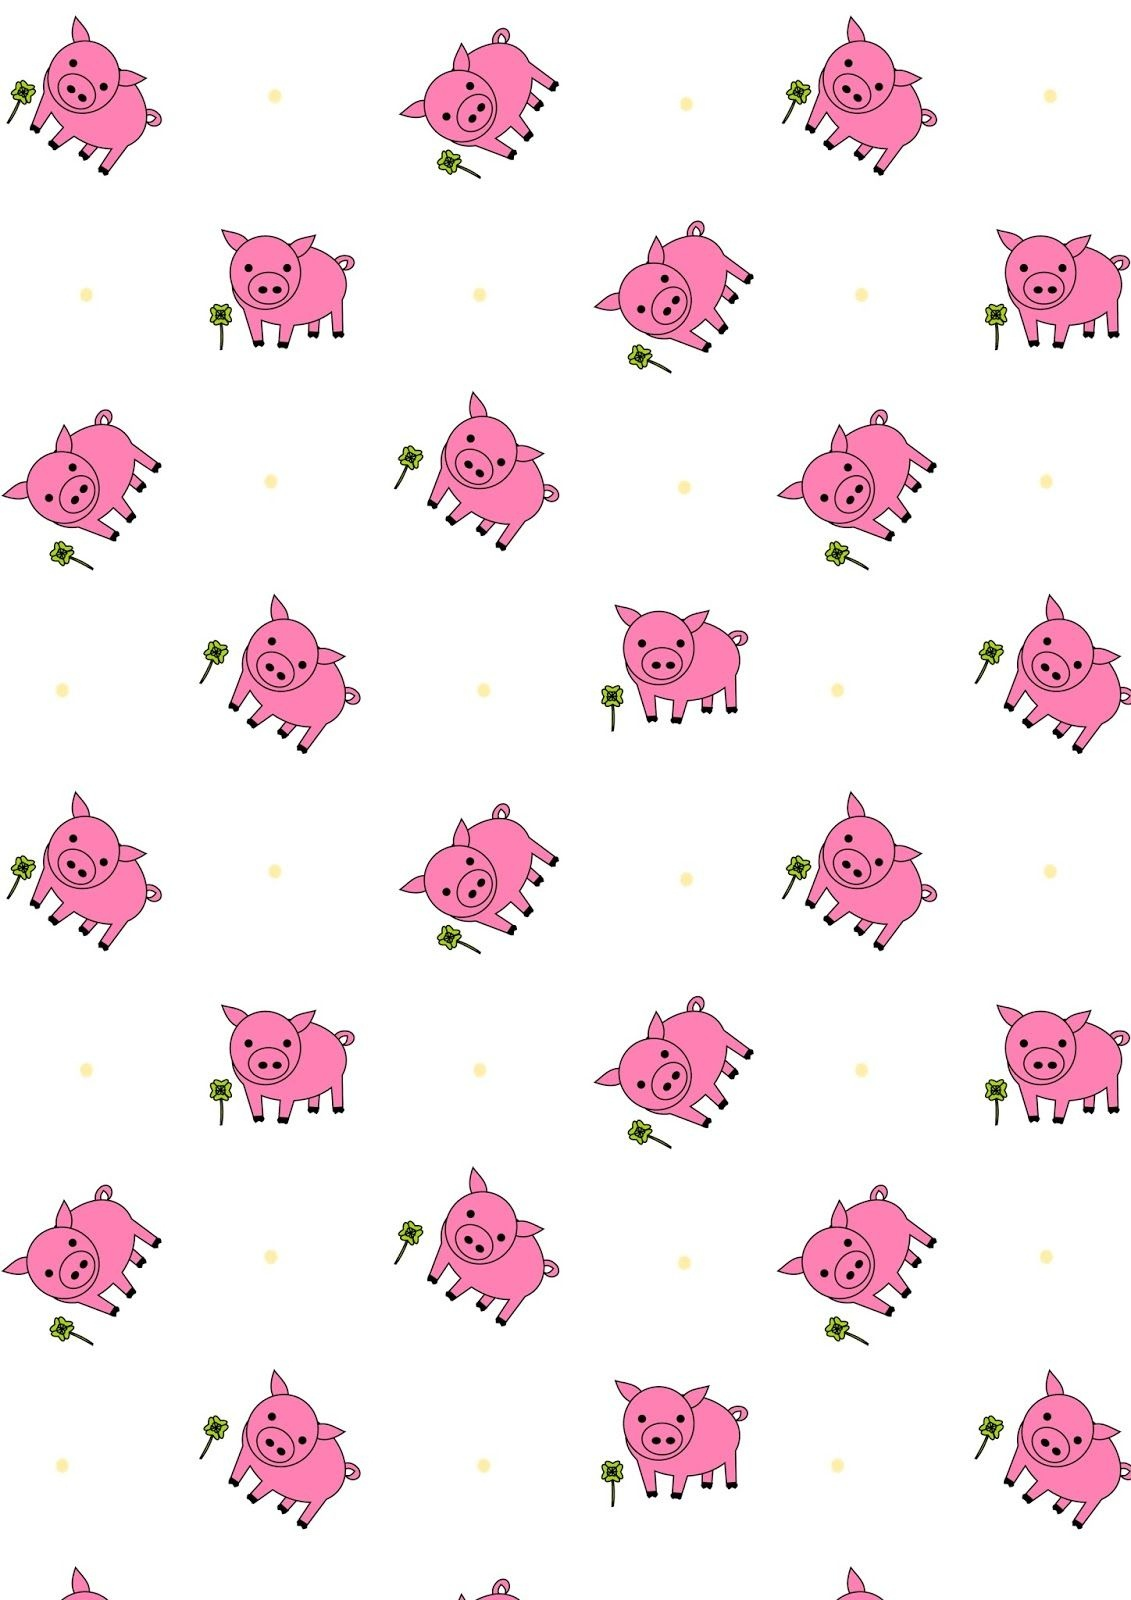 Free Printable Lucky Pig Pattern Paper   Digi Papers Some Free - Free Printable Pattern Paper Sheets